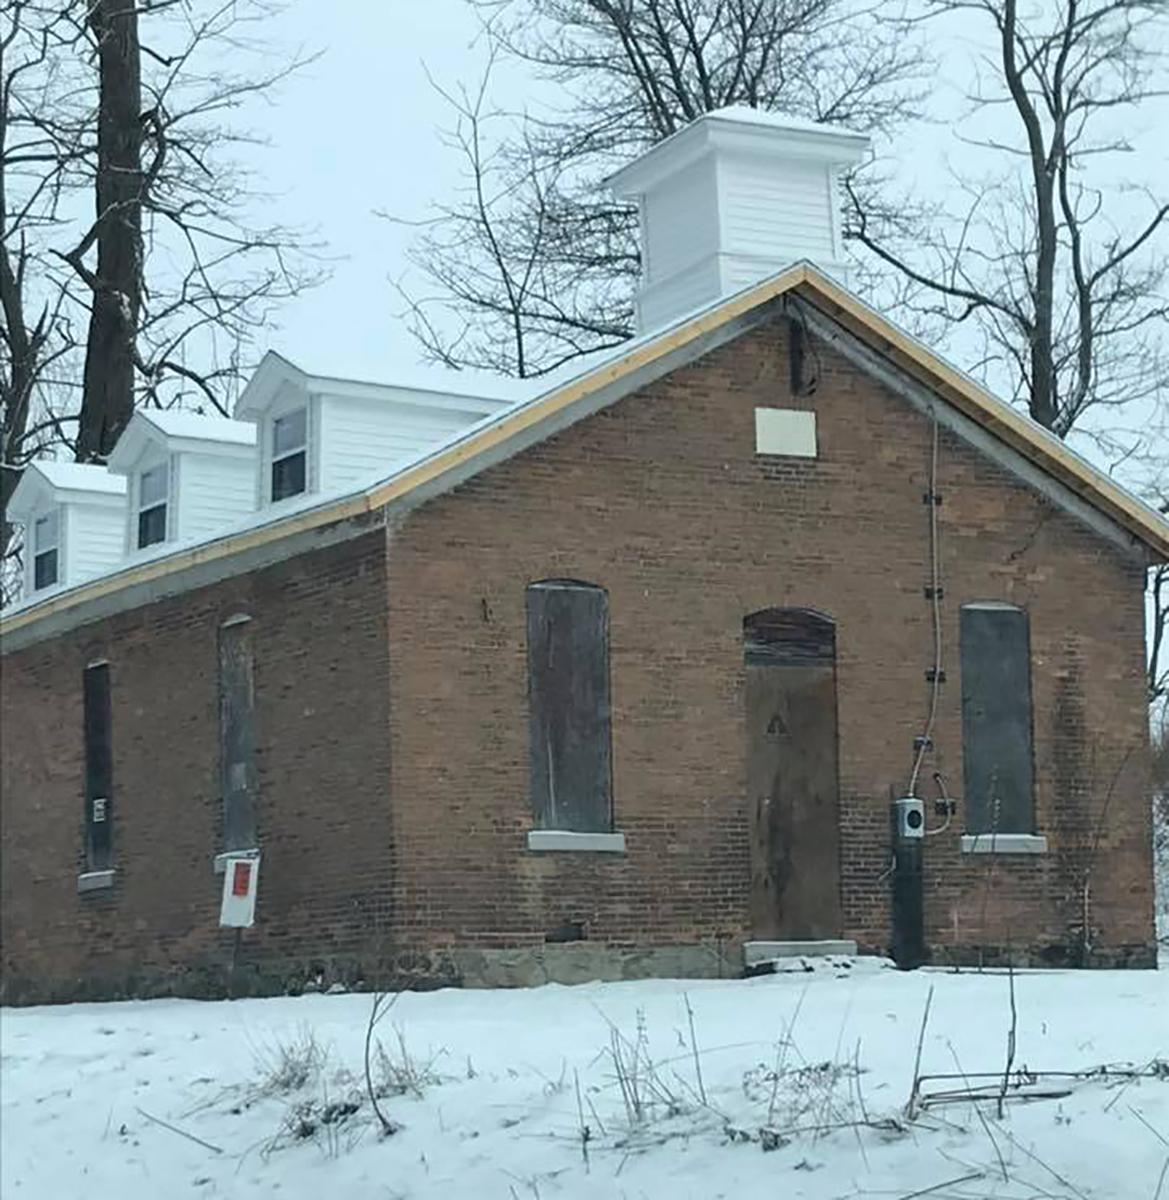 Historic Hydesville Schoolhouse